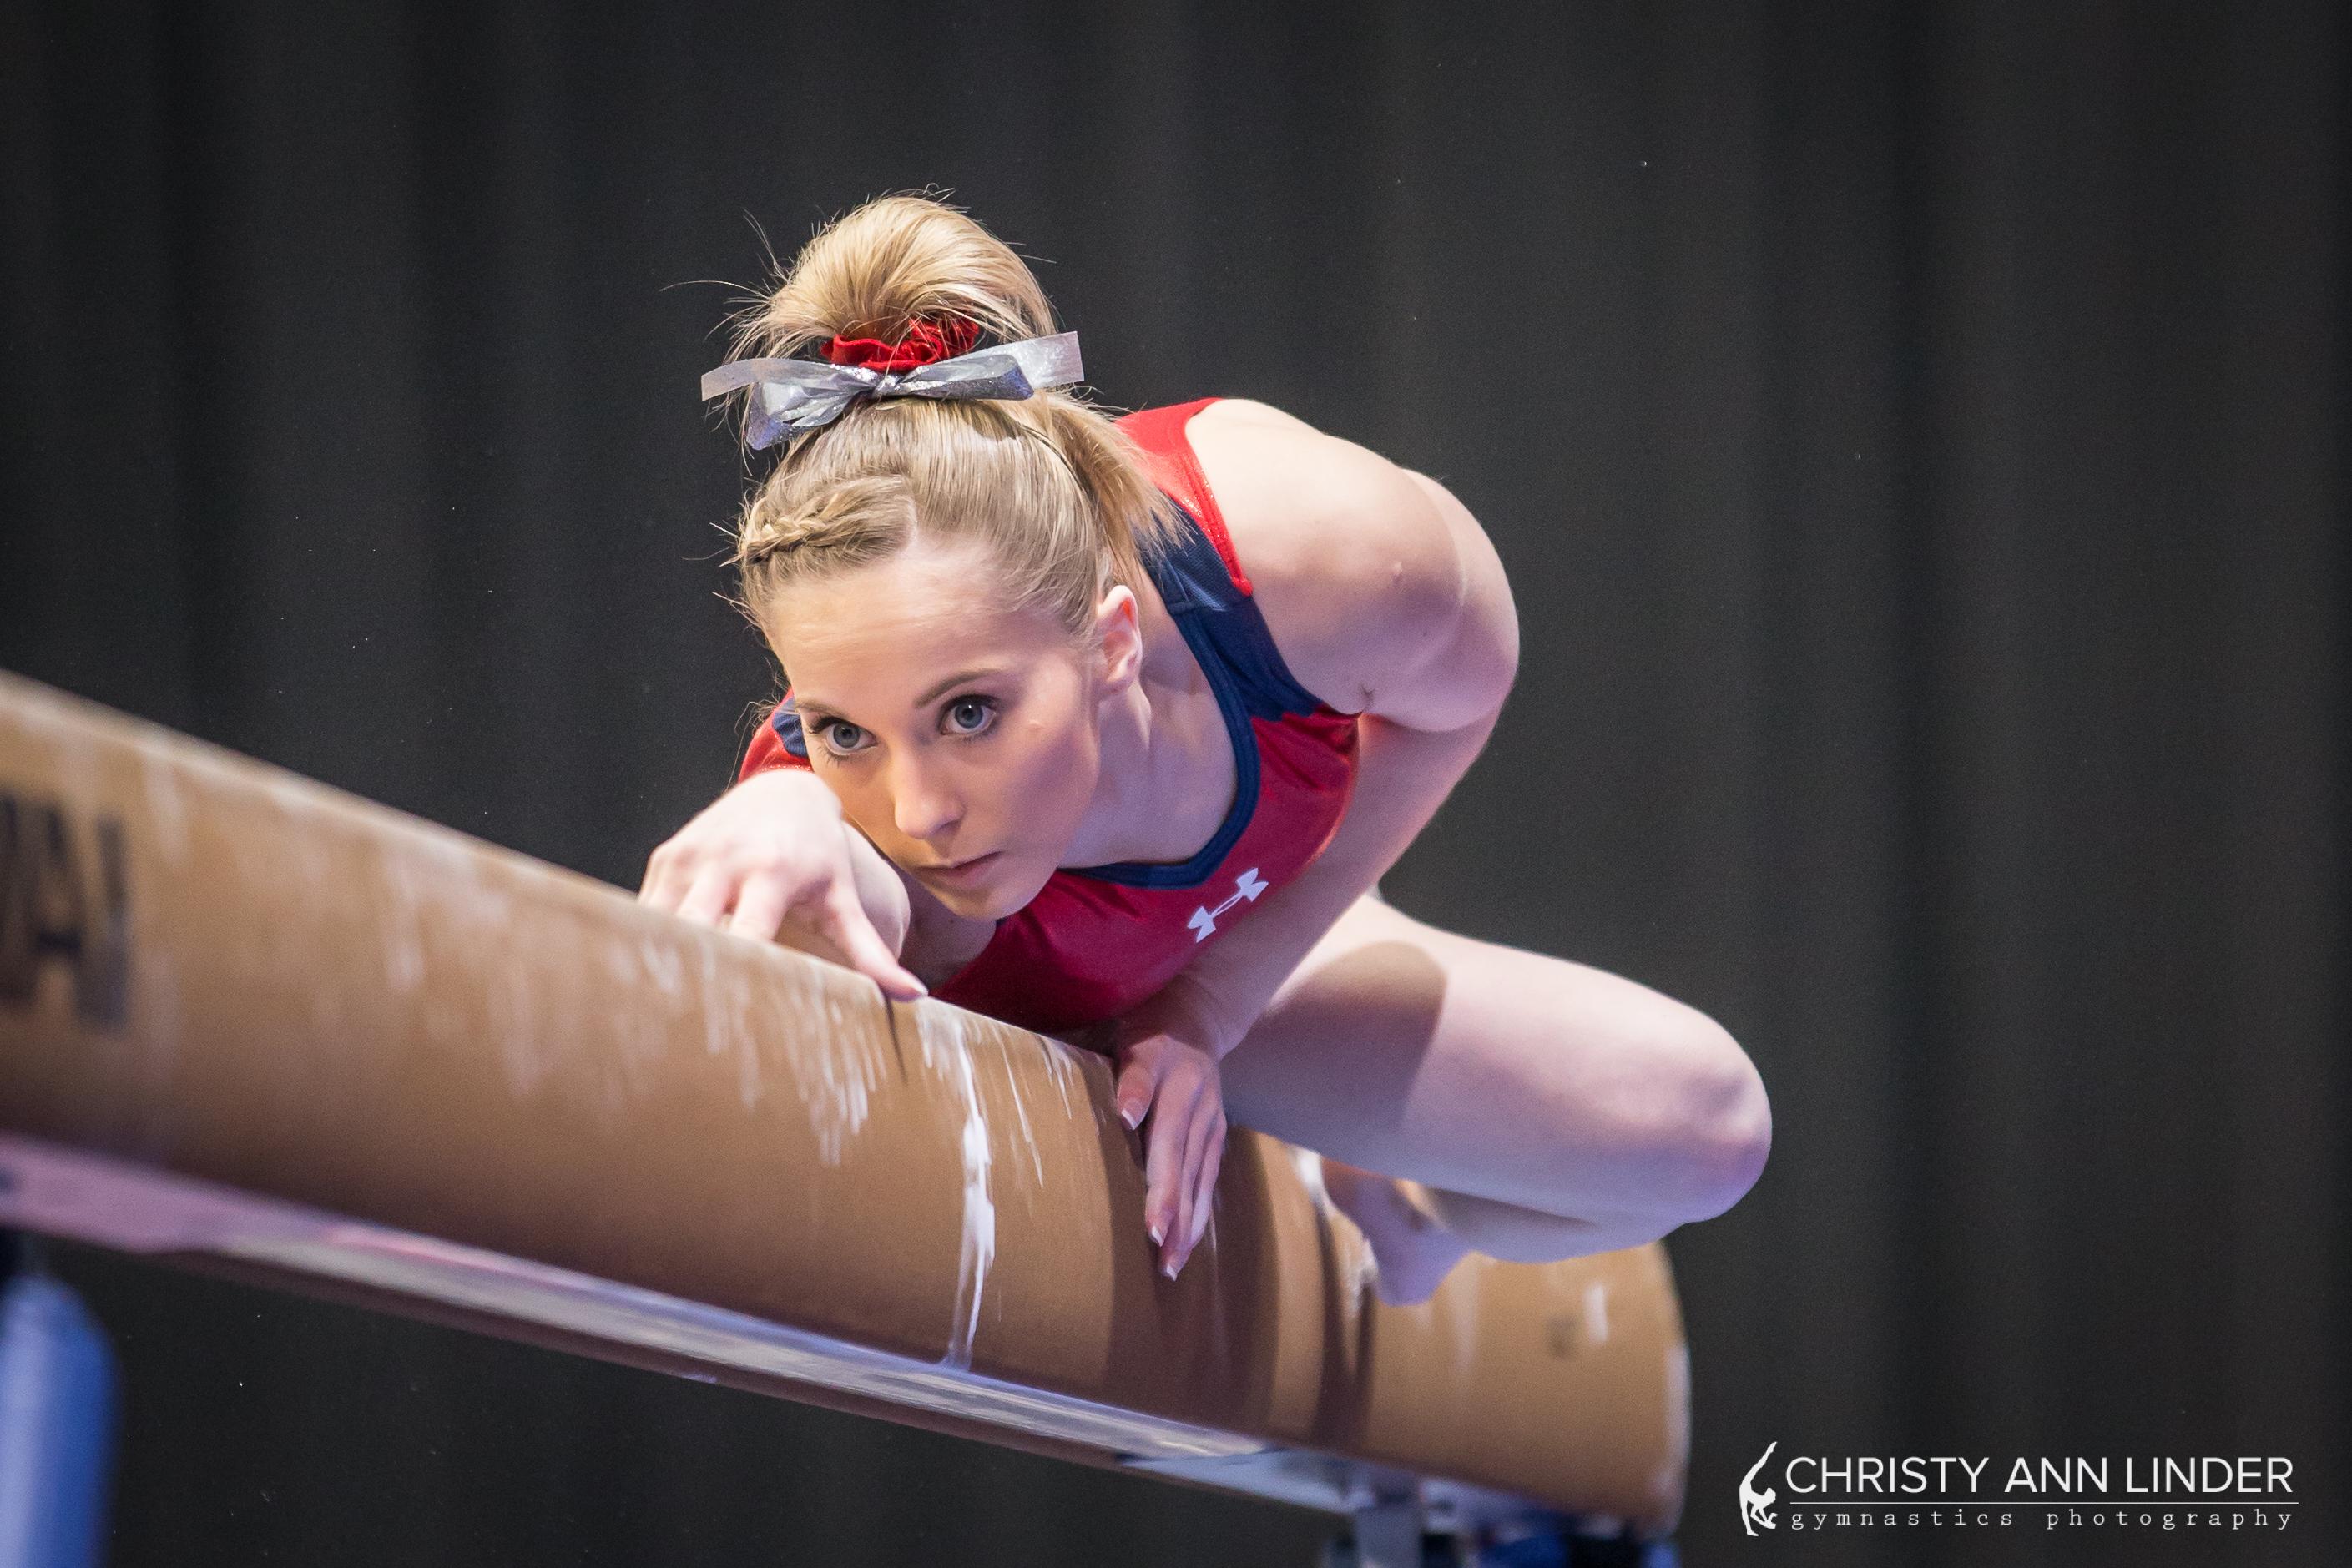 skinner-looks-down-the-beam